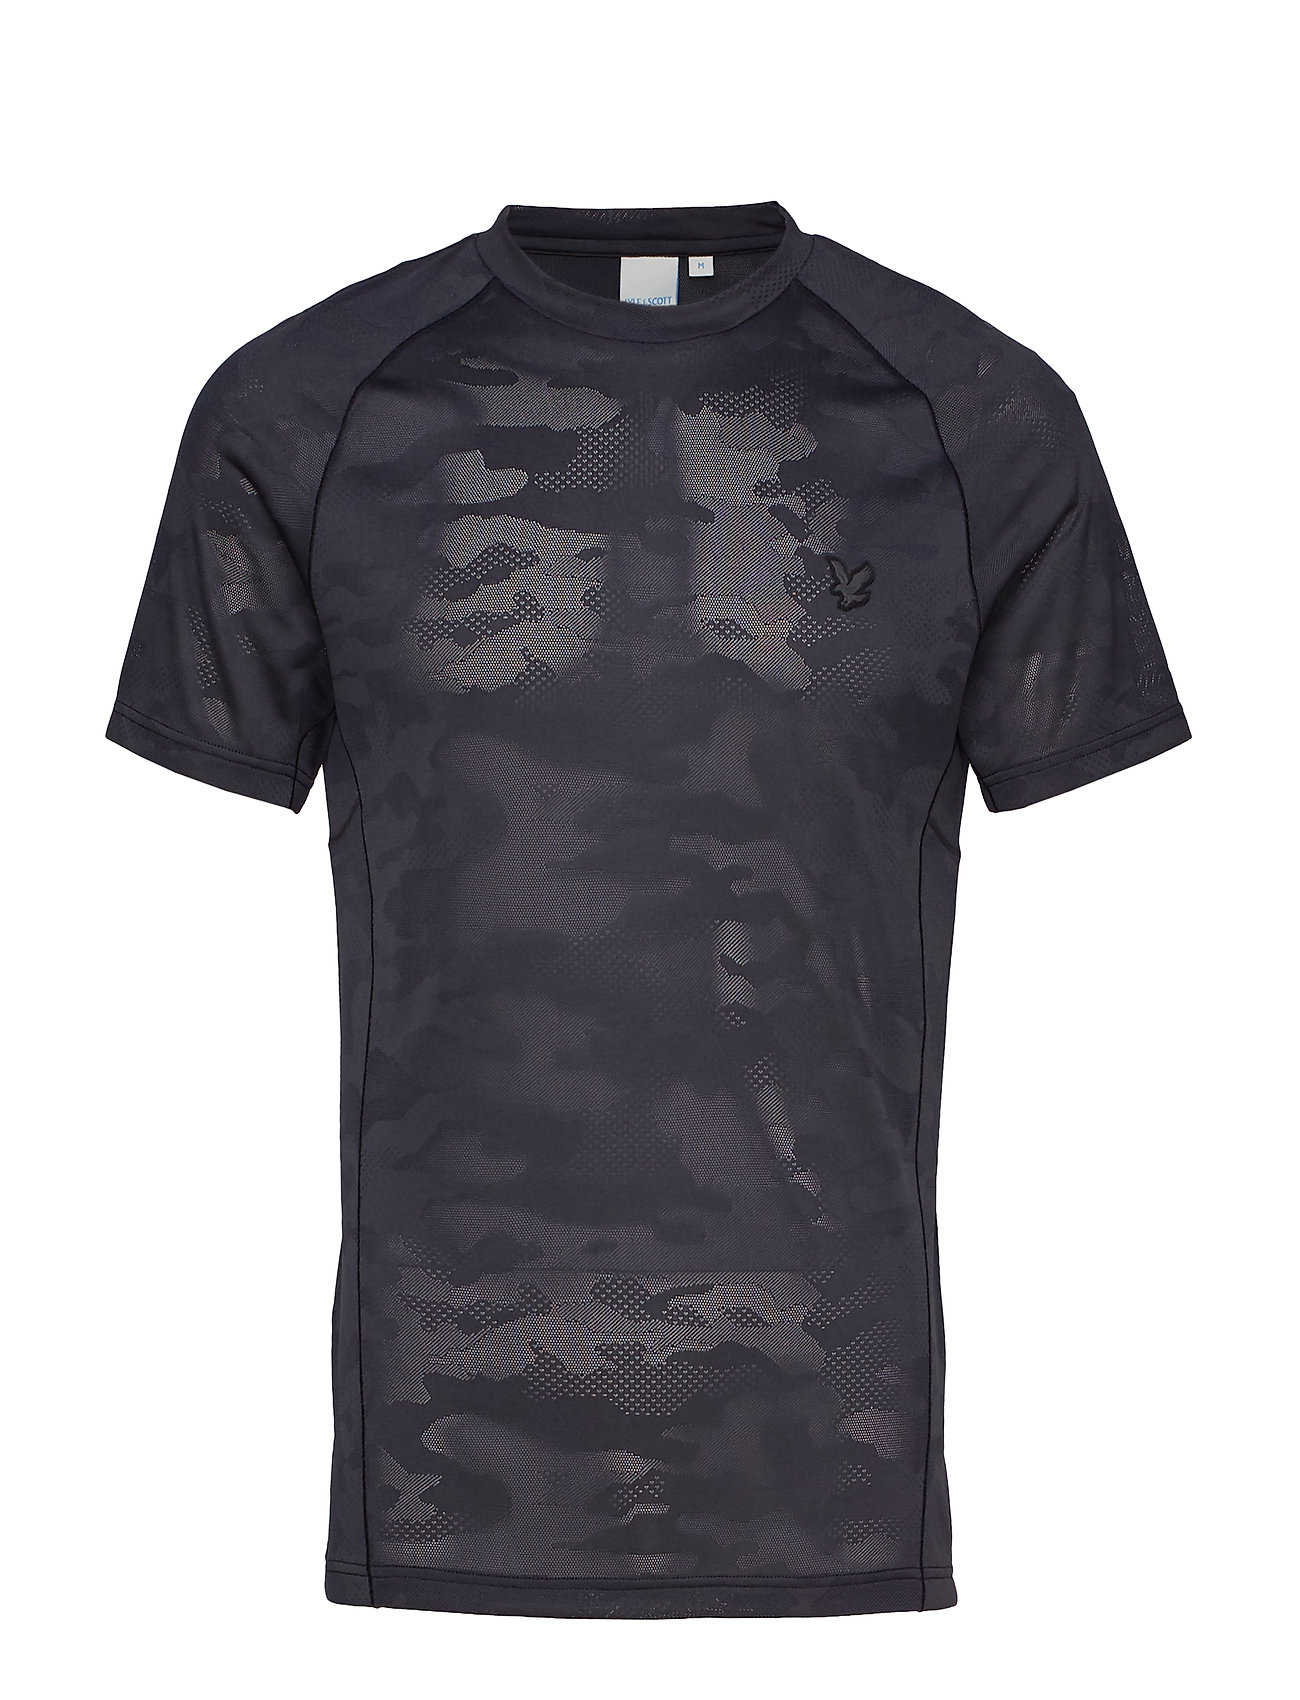 Lyle & Scott Black Ten SS T-Shirt - TRUE BLACK